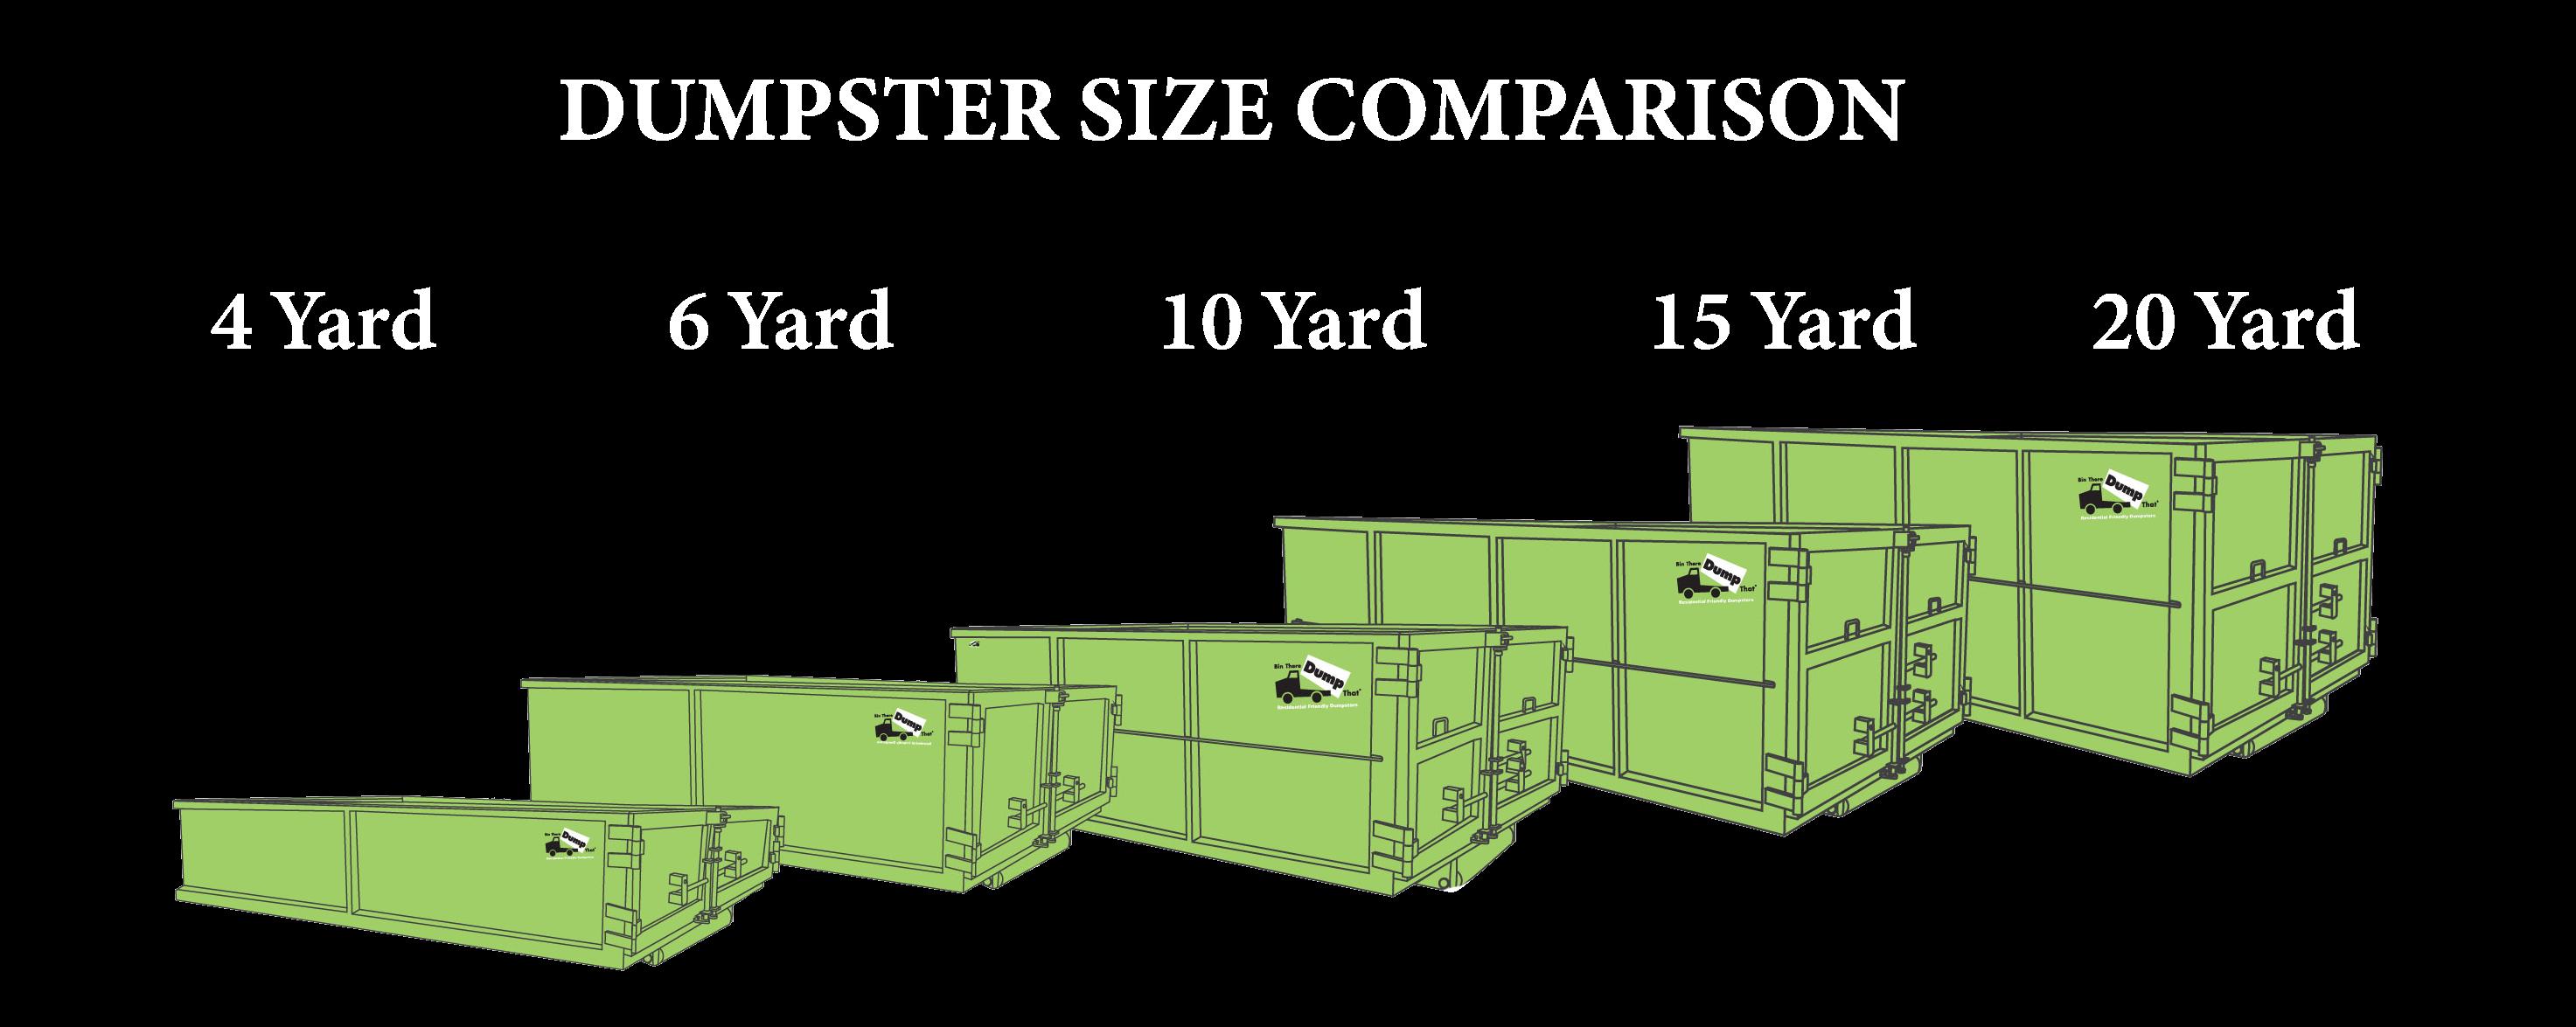 Dumpster Rental Comparisons Bin There Dump That Dumpster Sizes